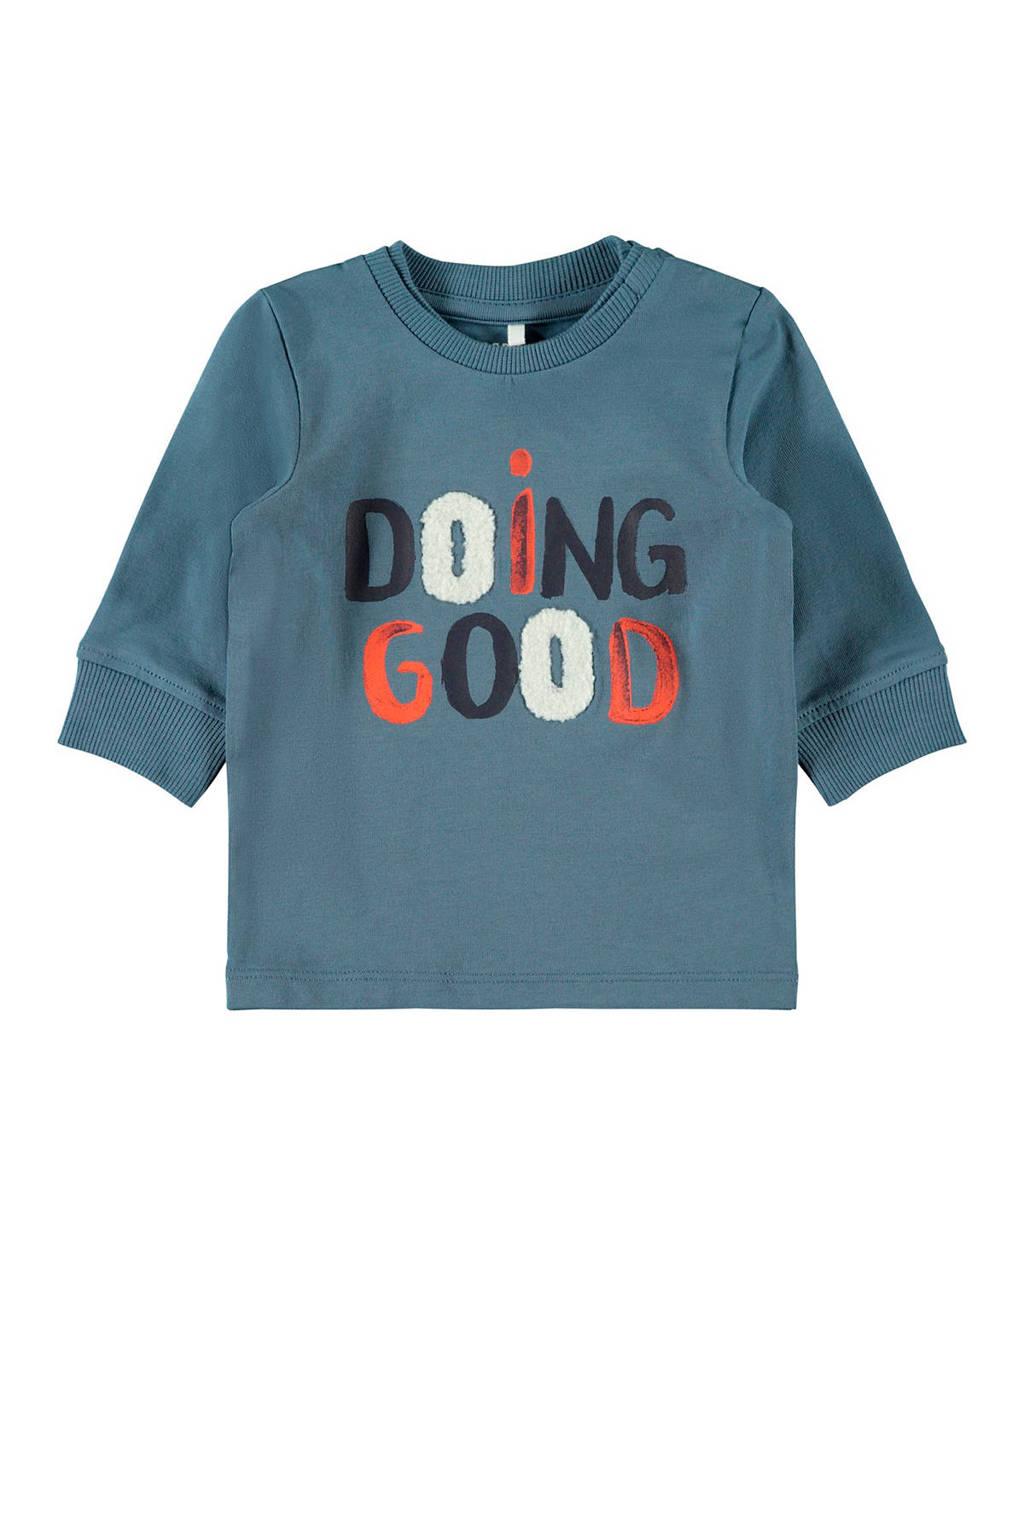 NAME IT BABY sweater met tekst blauw/oranje/zwart, Blauw/Oranje/Zwart